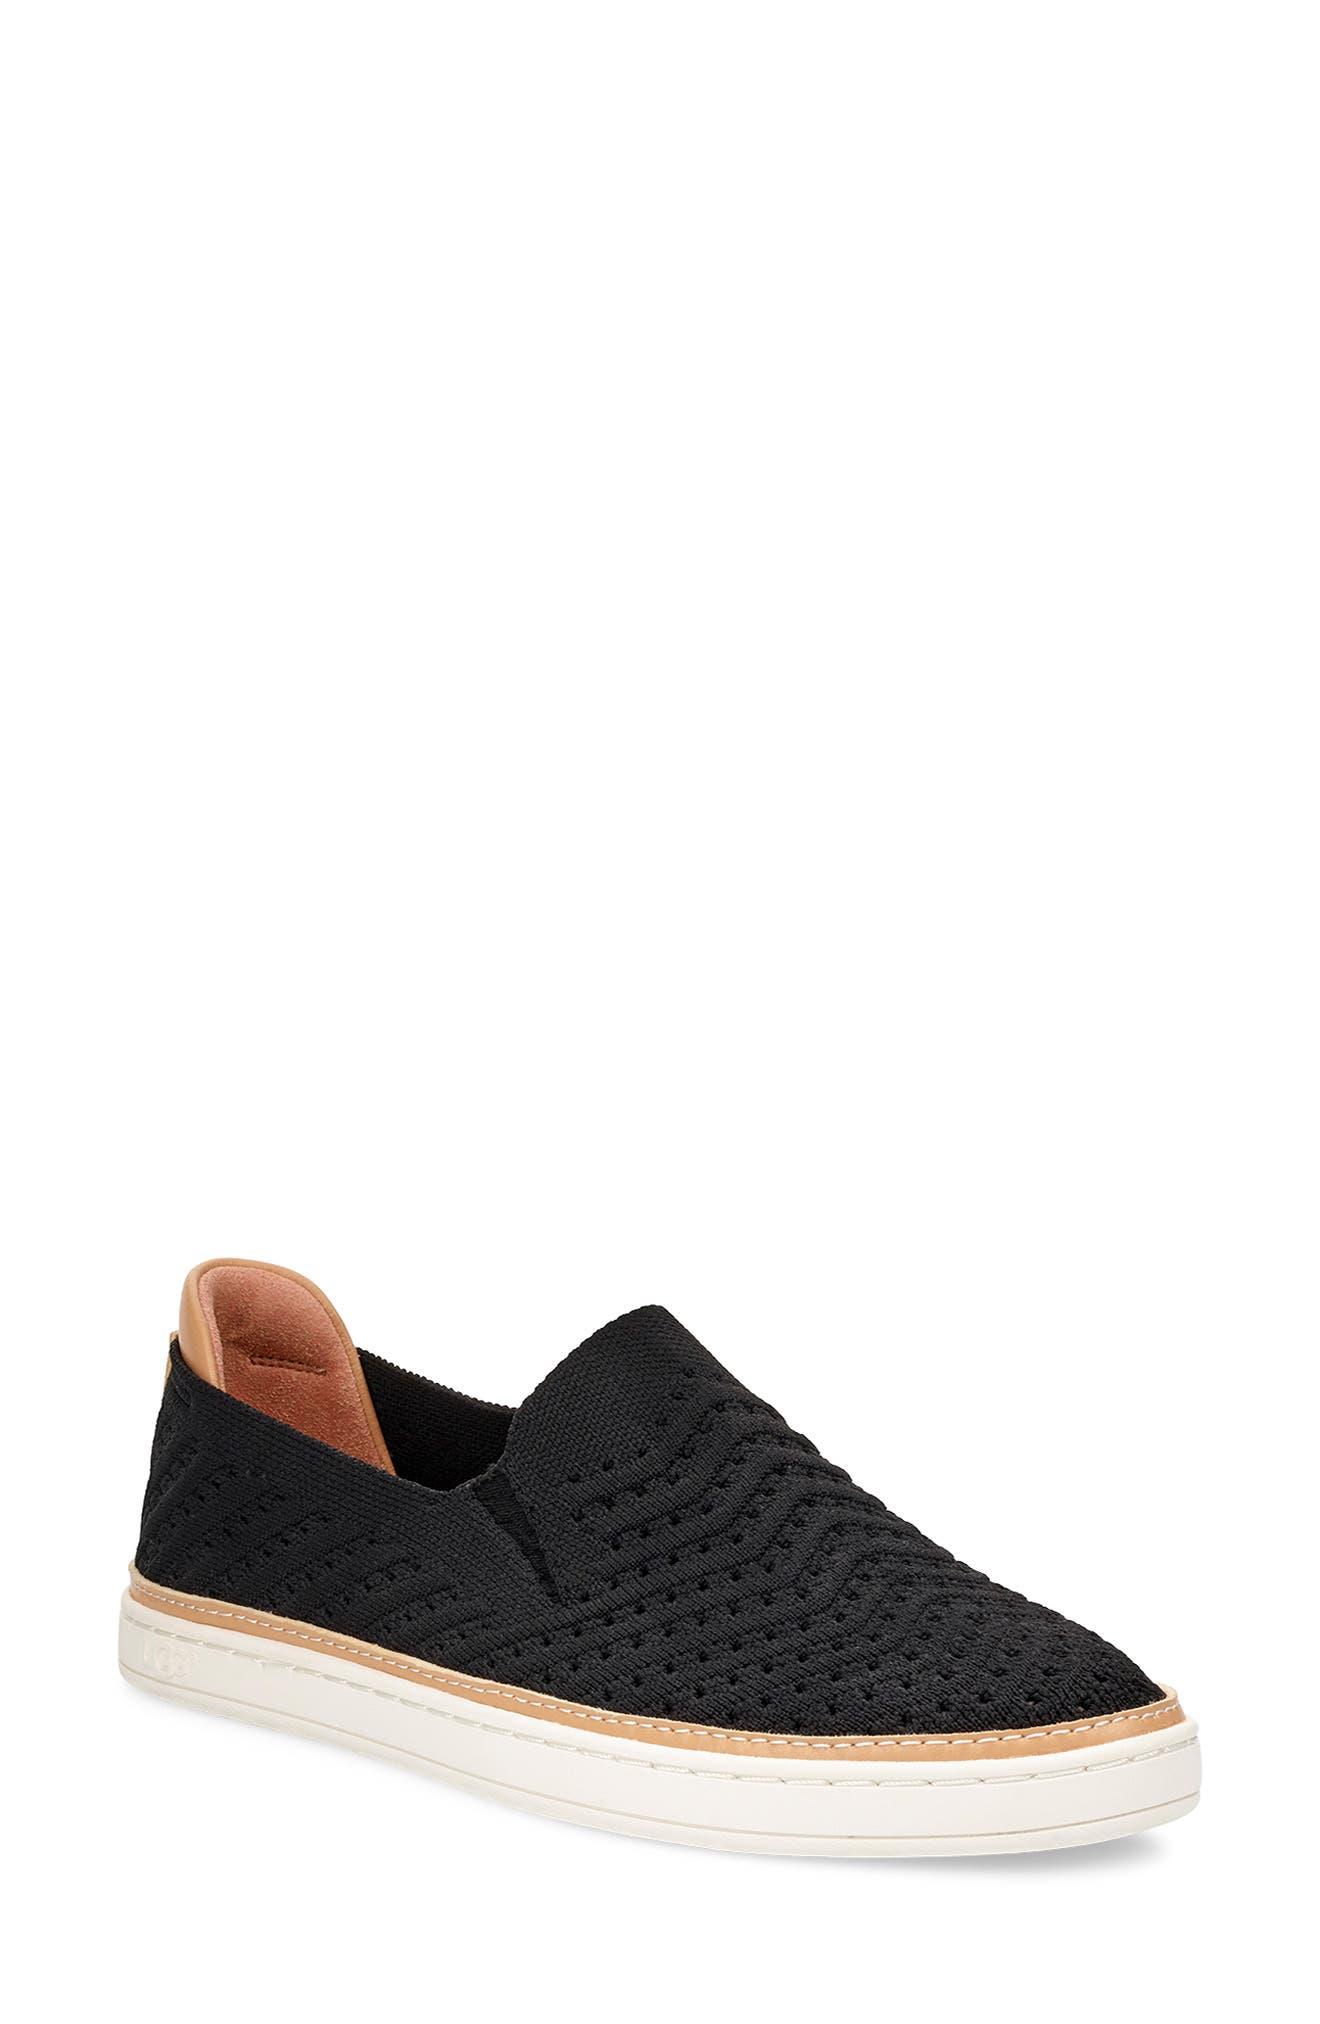 UGG<SUP>®</SUP>, Sammy Slip-On Sneaker, Main thumbnail 1, color, BLACK FABRIC